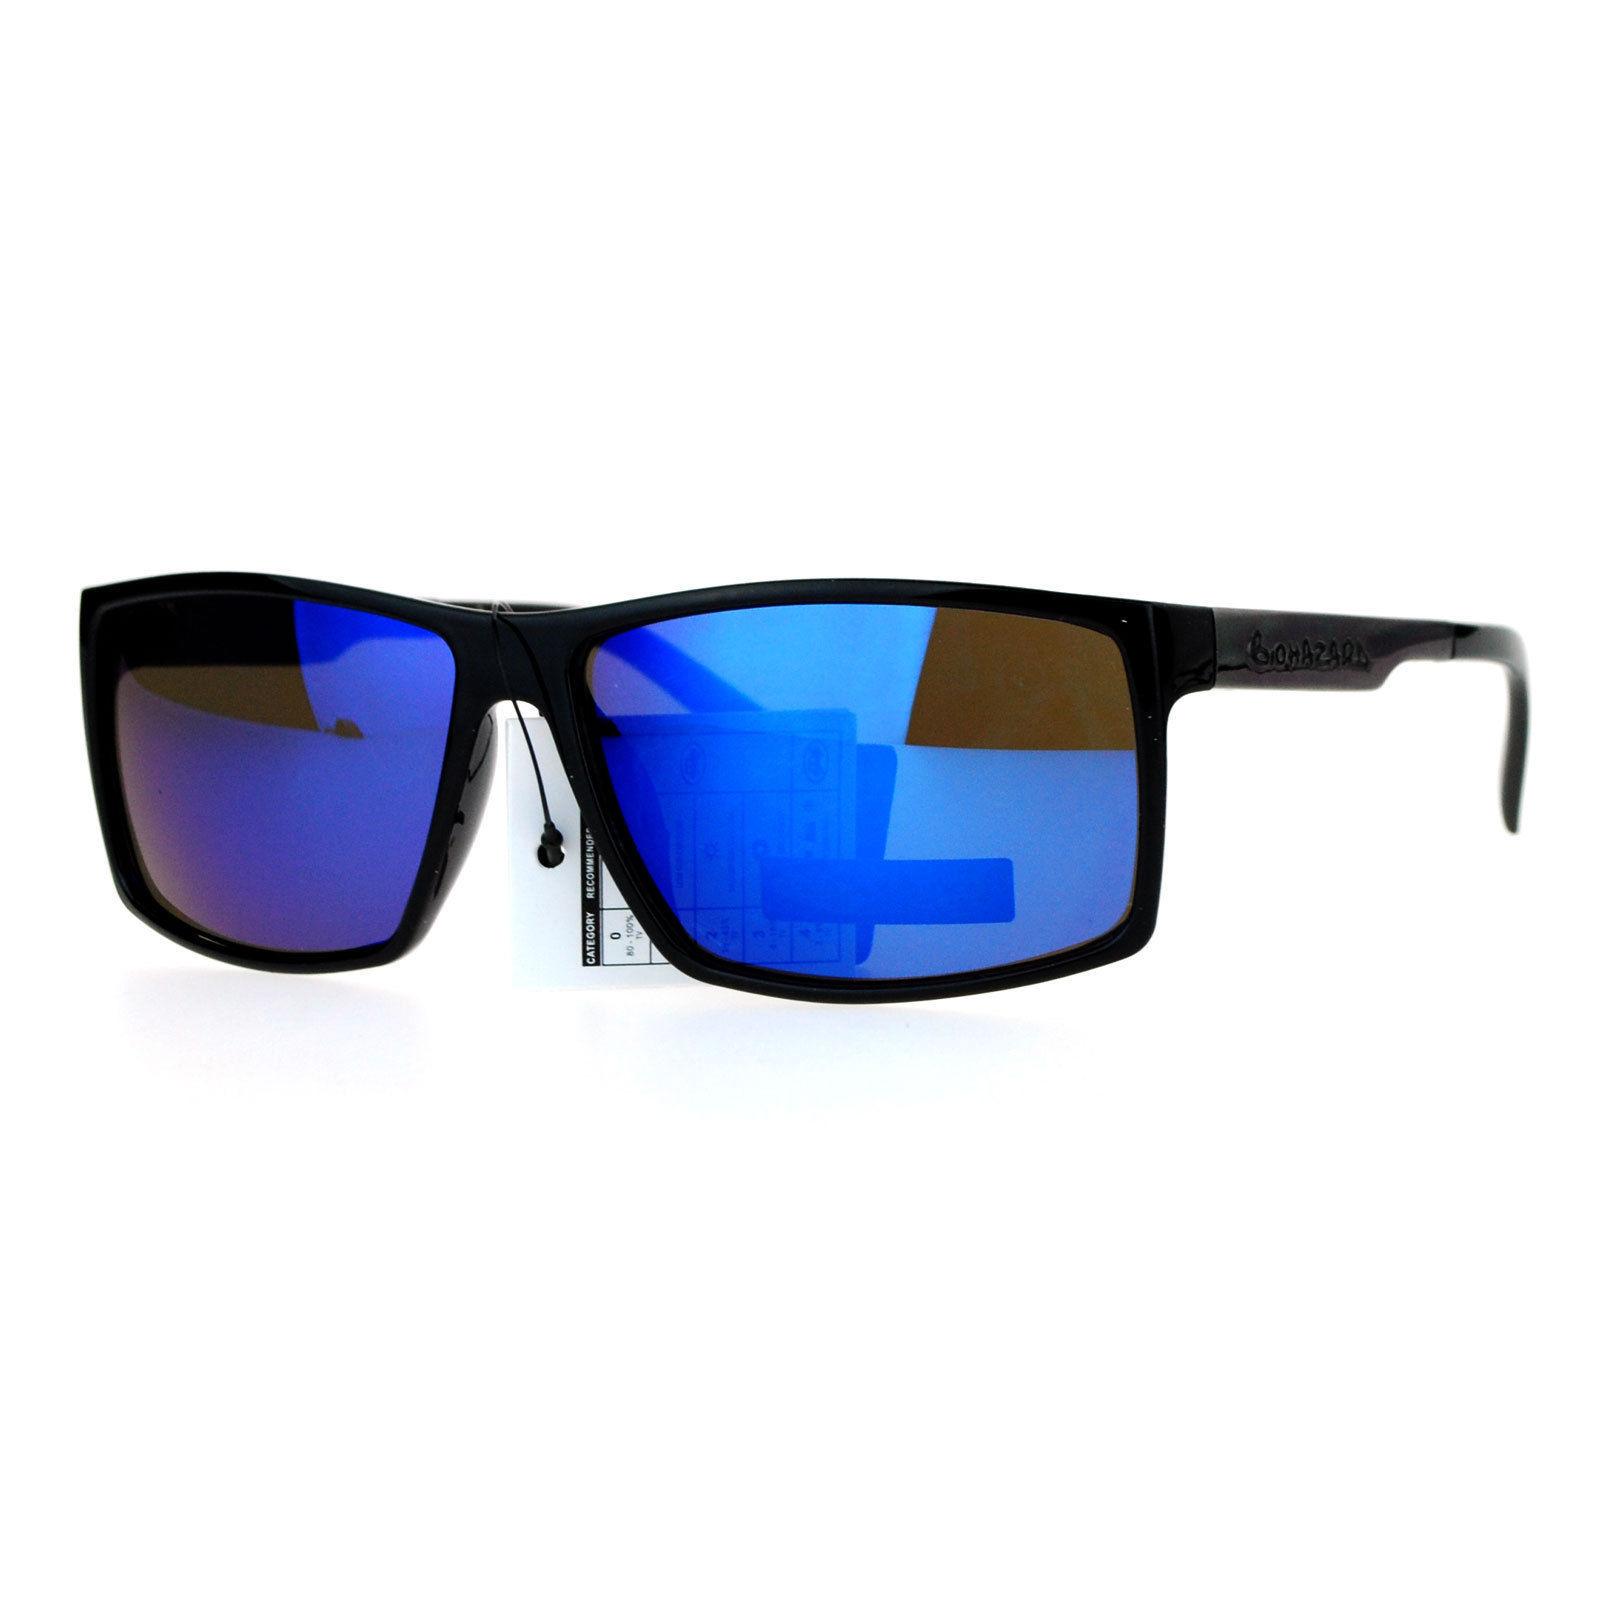 d631374c9c6 ... Biohazard Mens Sunglasses Rectangular Designer Fashion Shades UV 400 ...